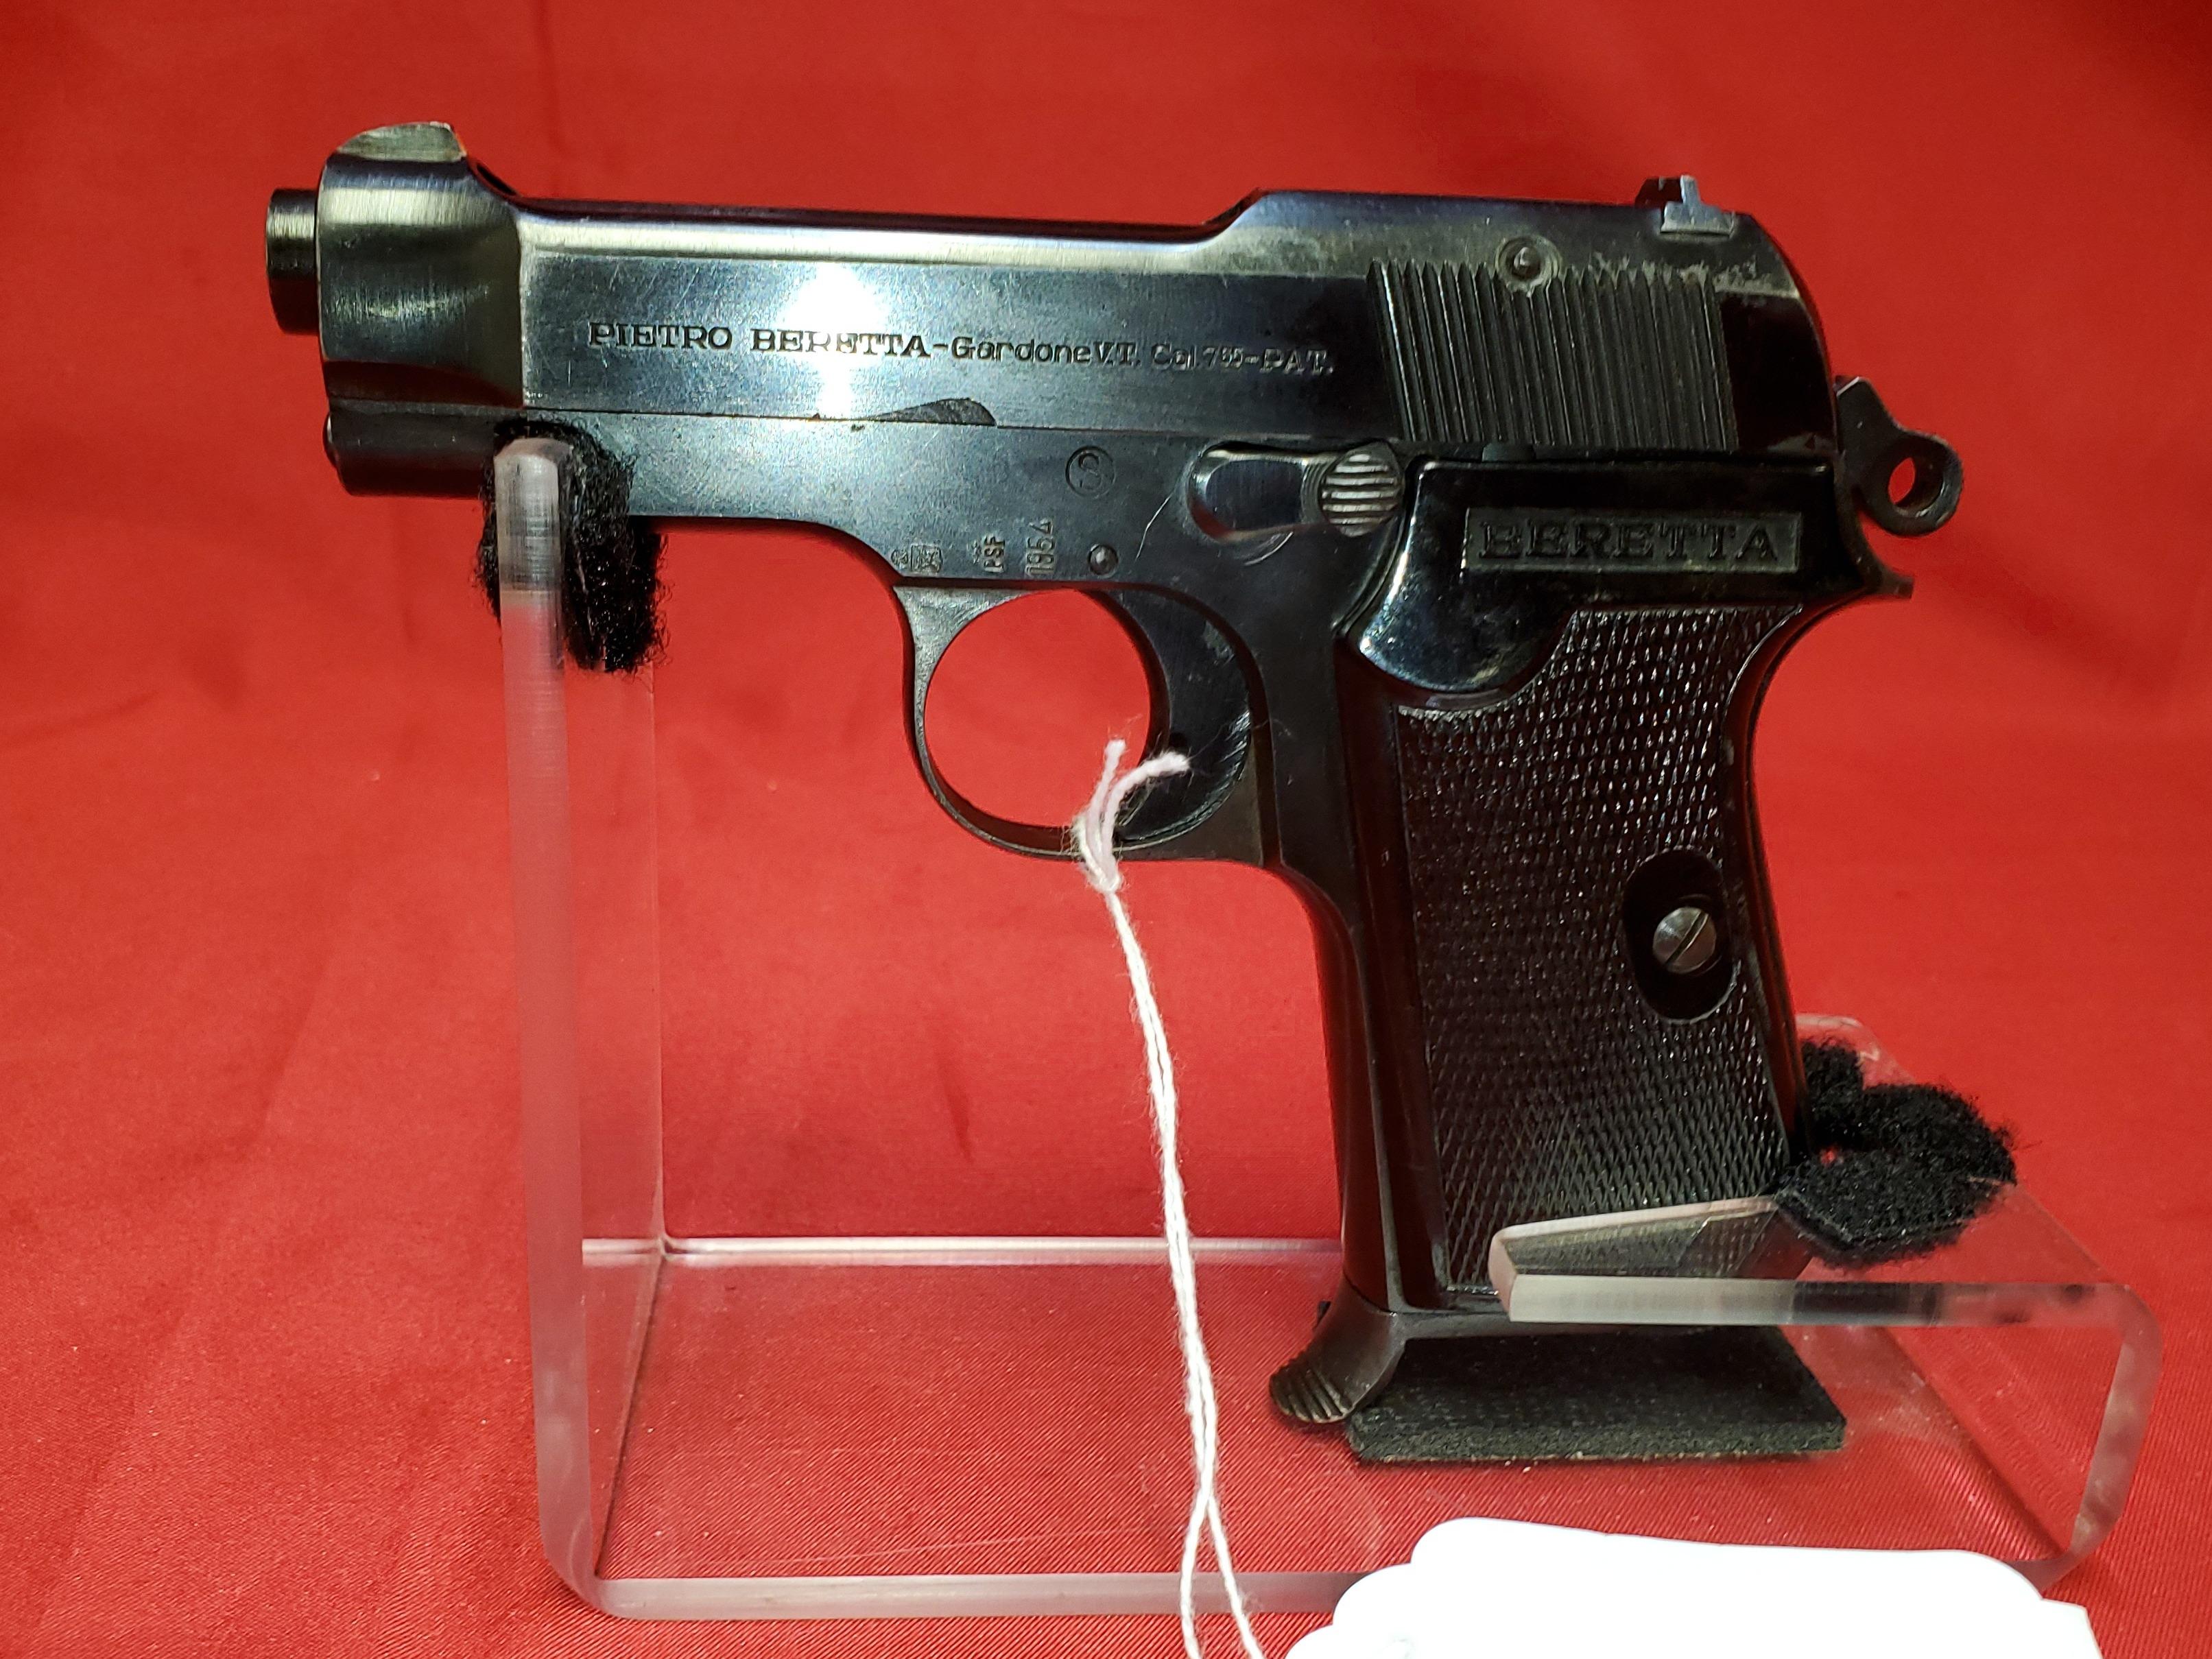 BERETTA M1935 - 32 CAL PISTOL, 1 MAG, CAMO CASE